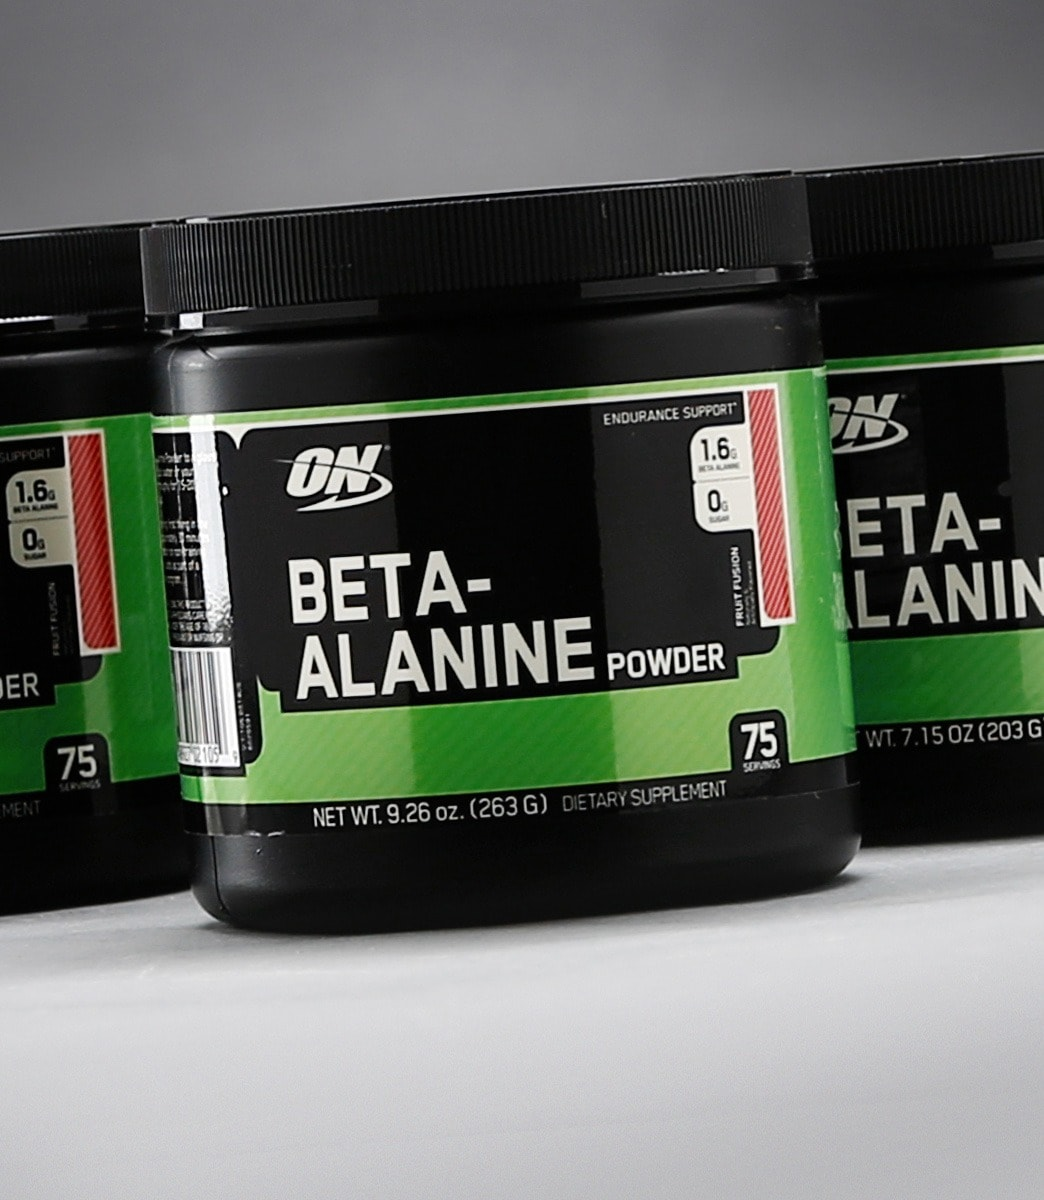 Optimum Nutrition - Beta-Alanine Powder (75 lần dùng) - 4726e06bdf4b6bd02e59f6f8ffd91fc7